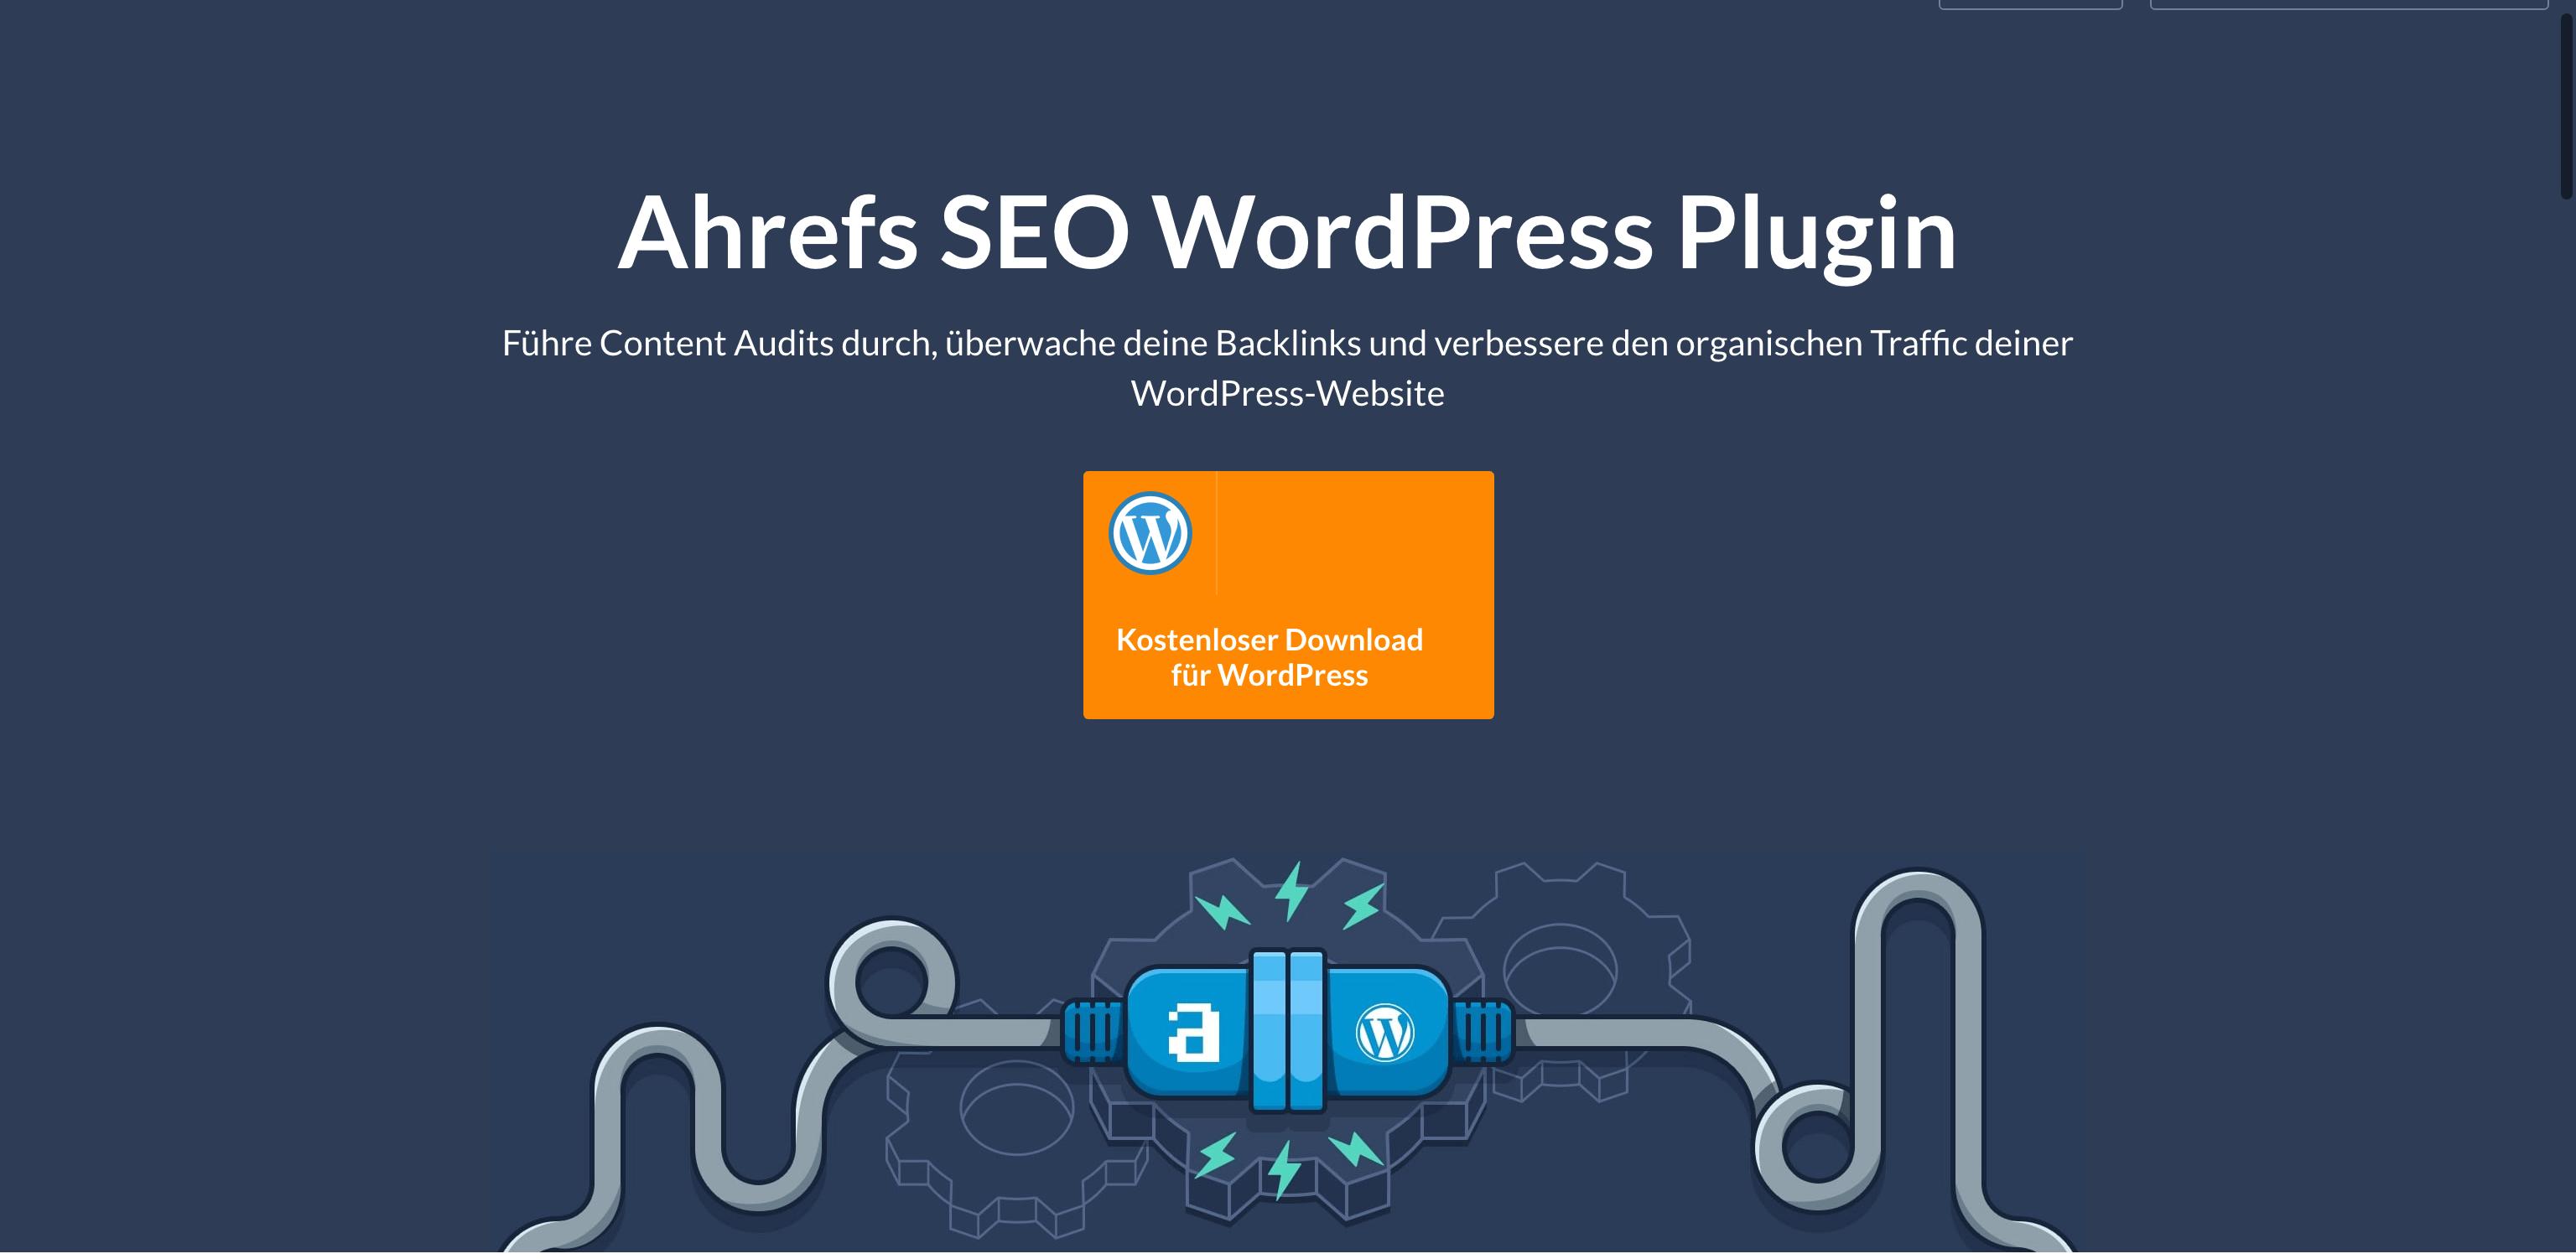 Ahrefs SEO WordPress Plugin